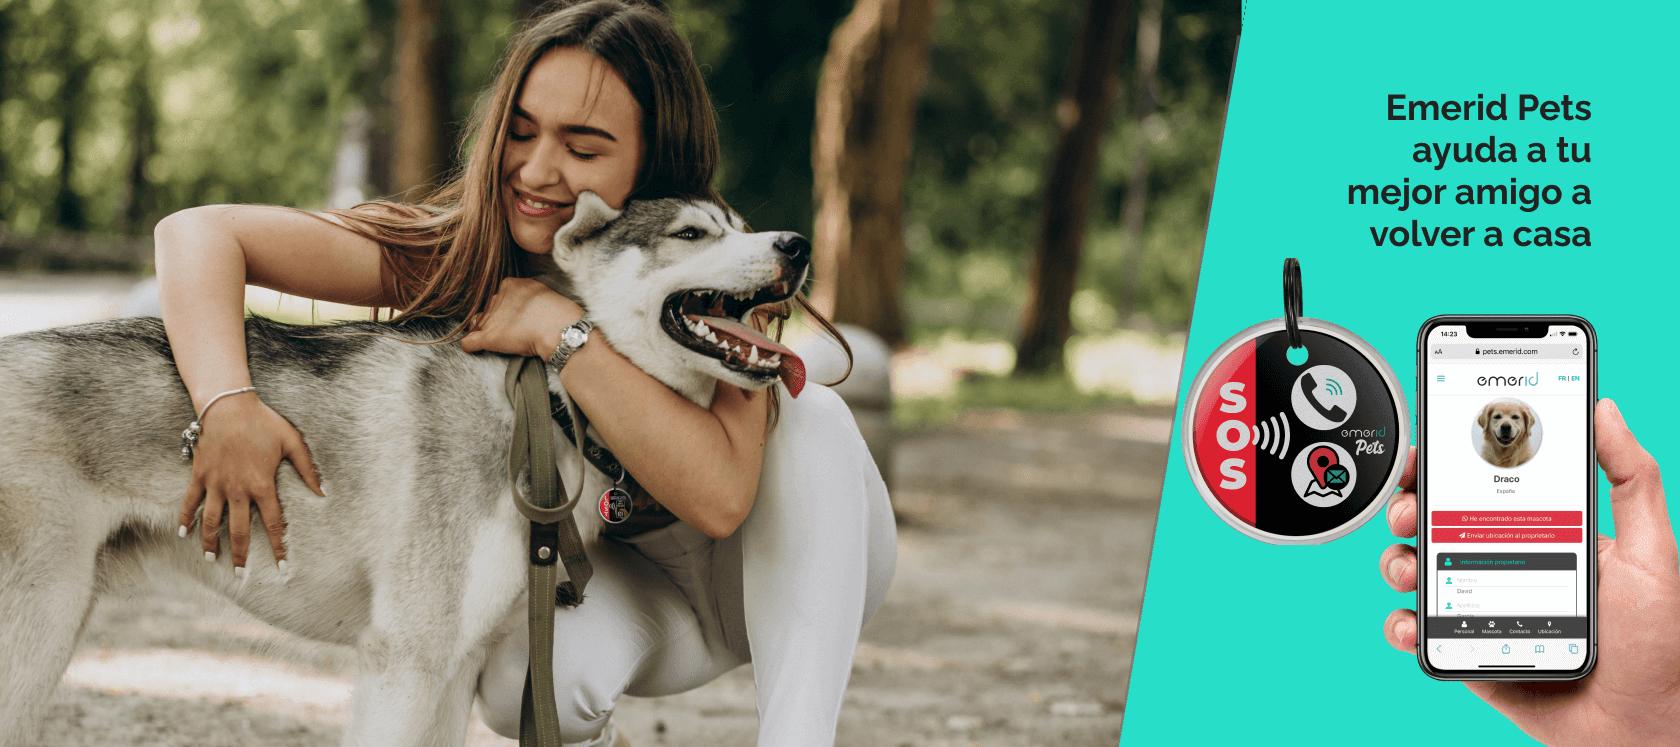 /product/placa-de-identificacion-mascotas-emerid-pets